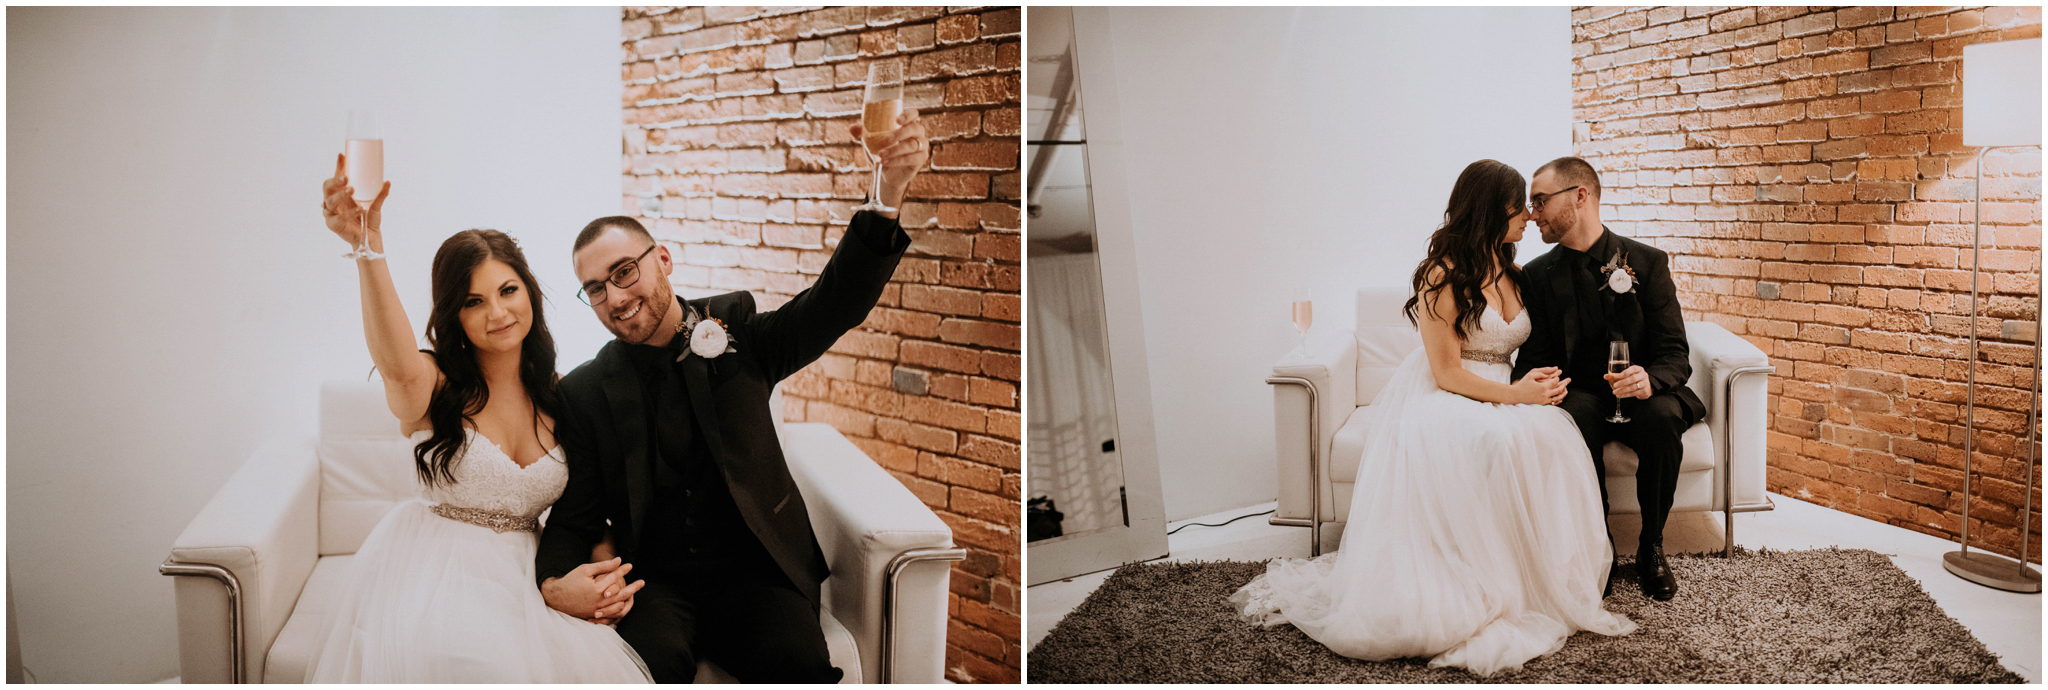 danny+mackenzie+downtown-seattle-axis-wedding-seattle-photographer-085.jpg